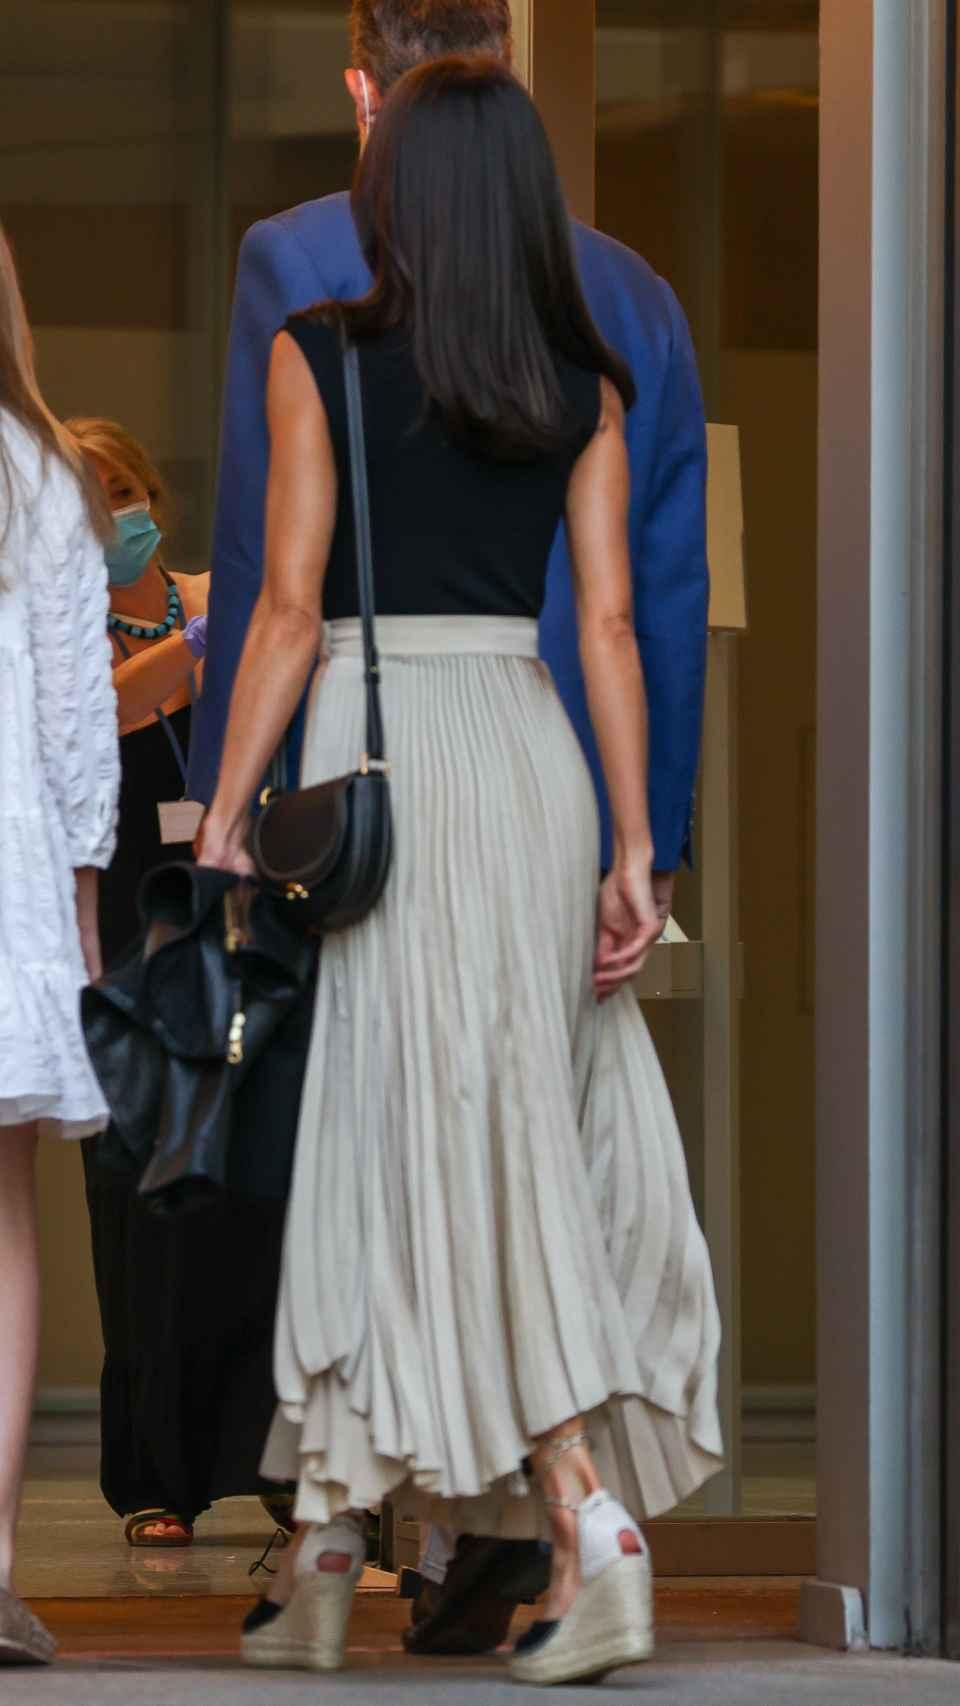 El nuevo bolso de Carolina Herrera de la Reina.